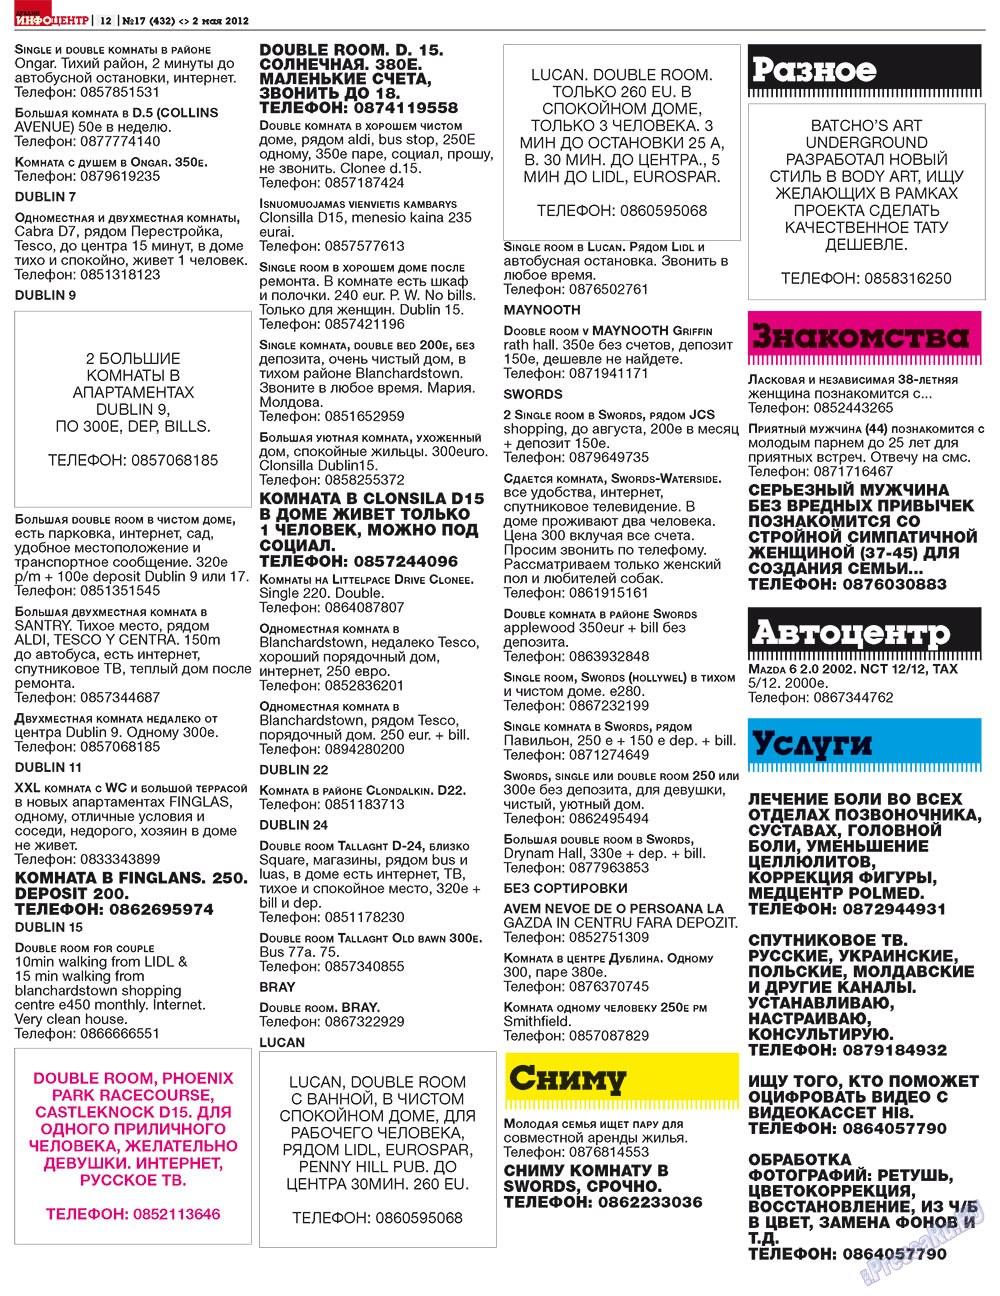 Дублин инфоцентр (газета). 2012 год, номер 17, стр. 12